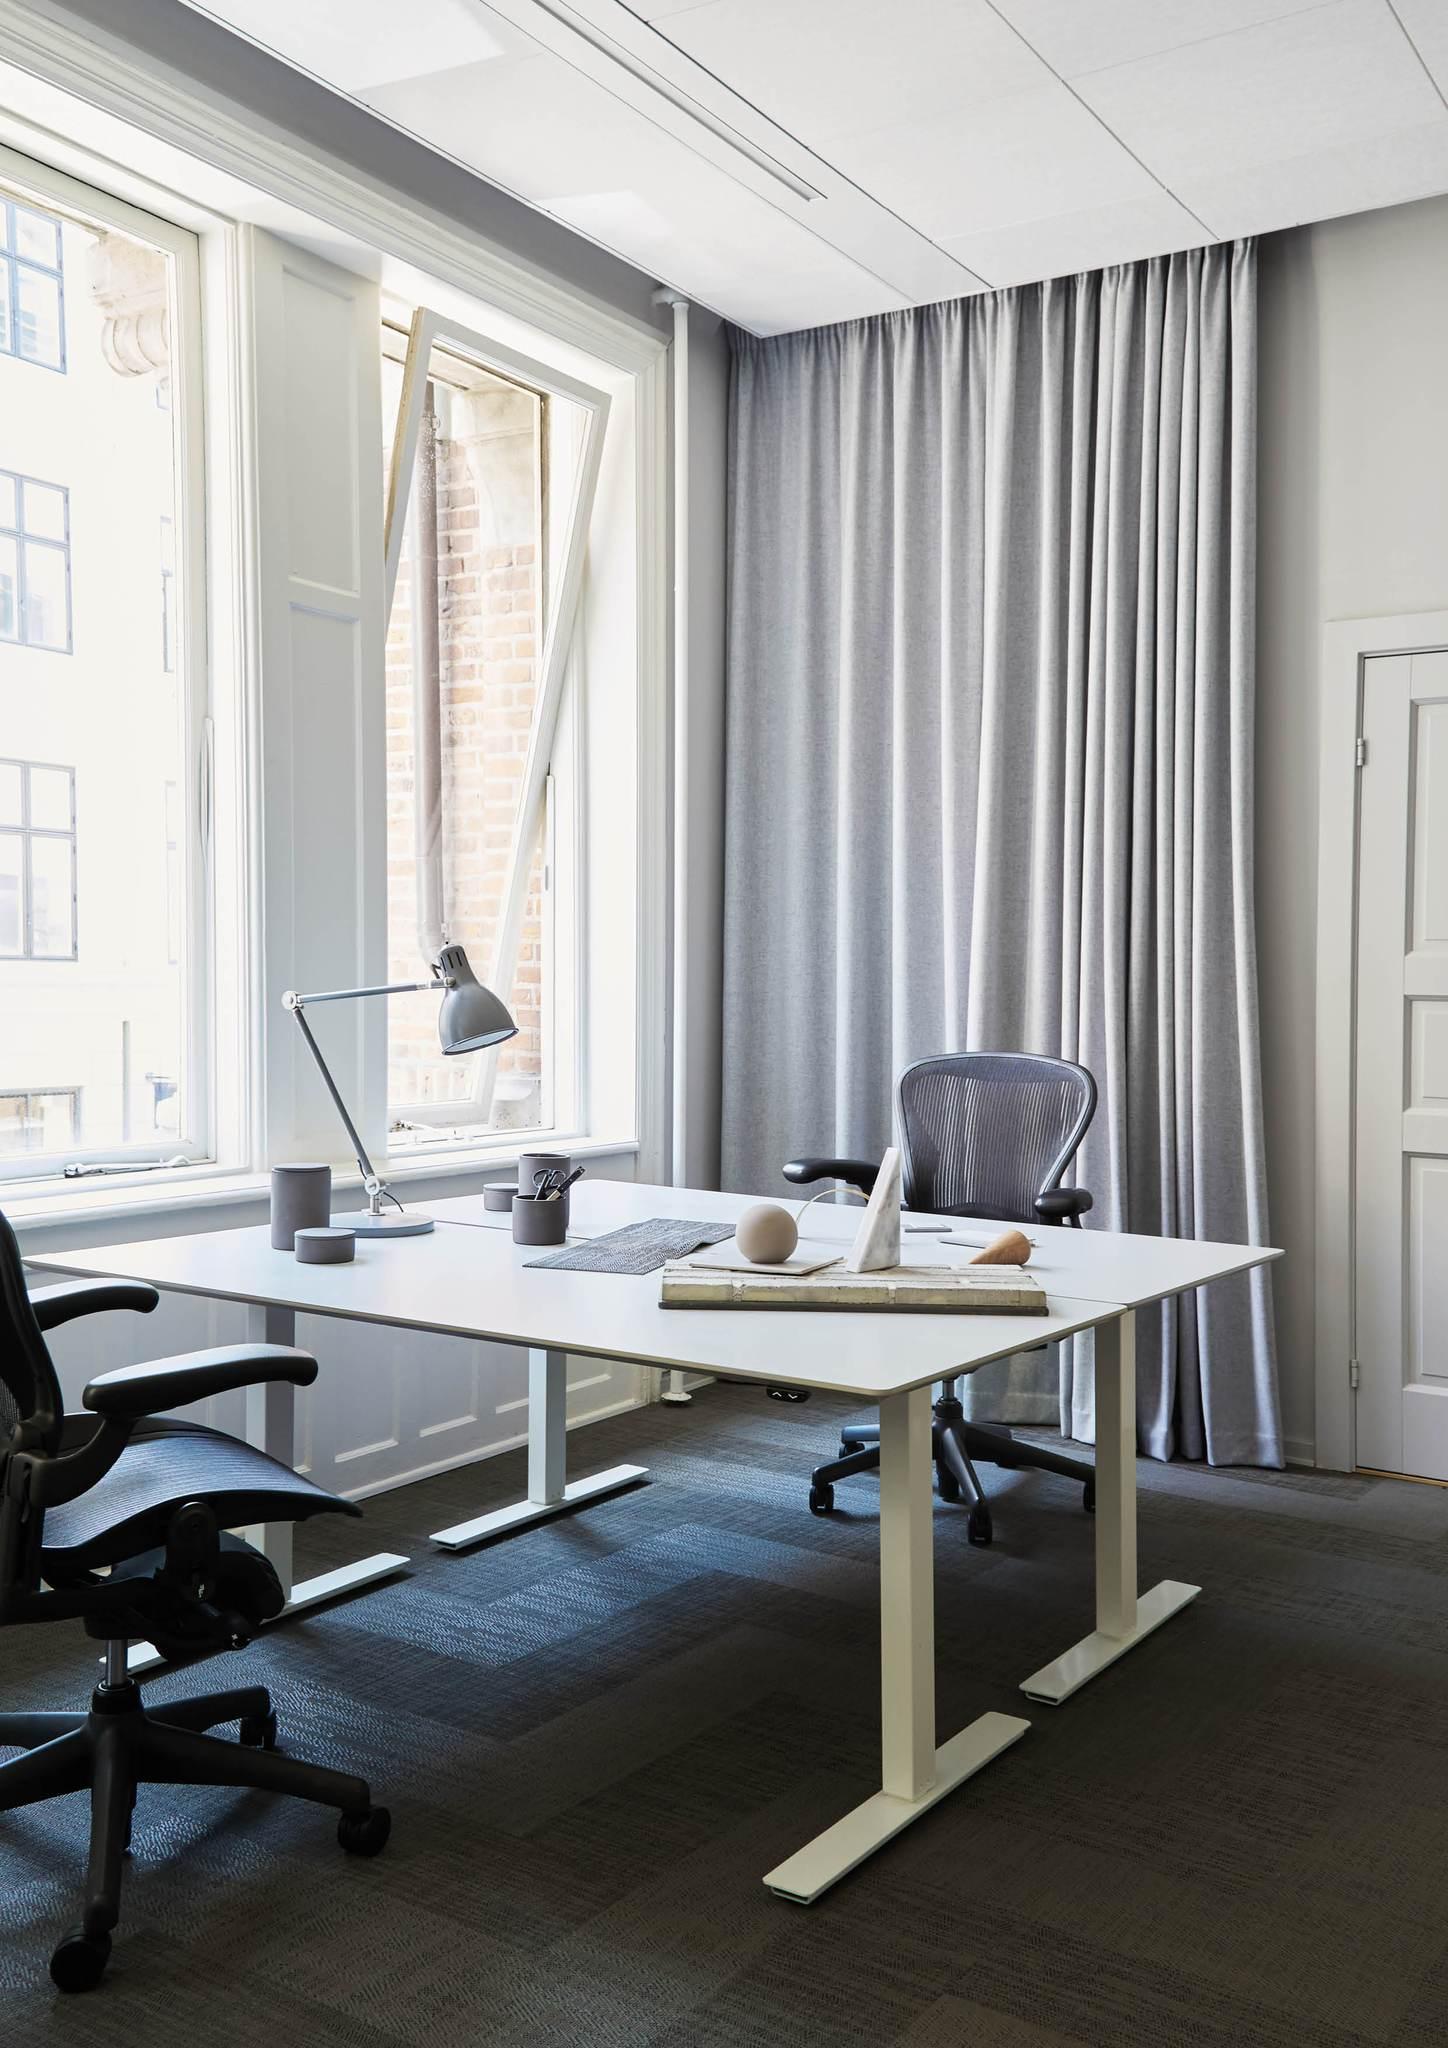 Kristiana-dam-studio-interio-office-2.jpg